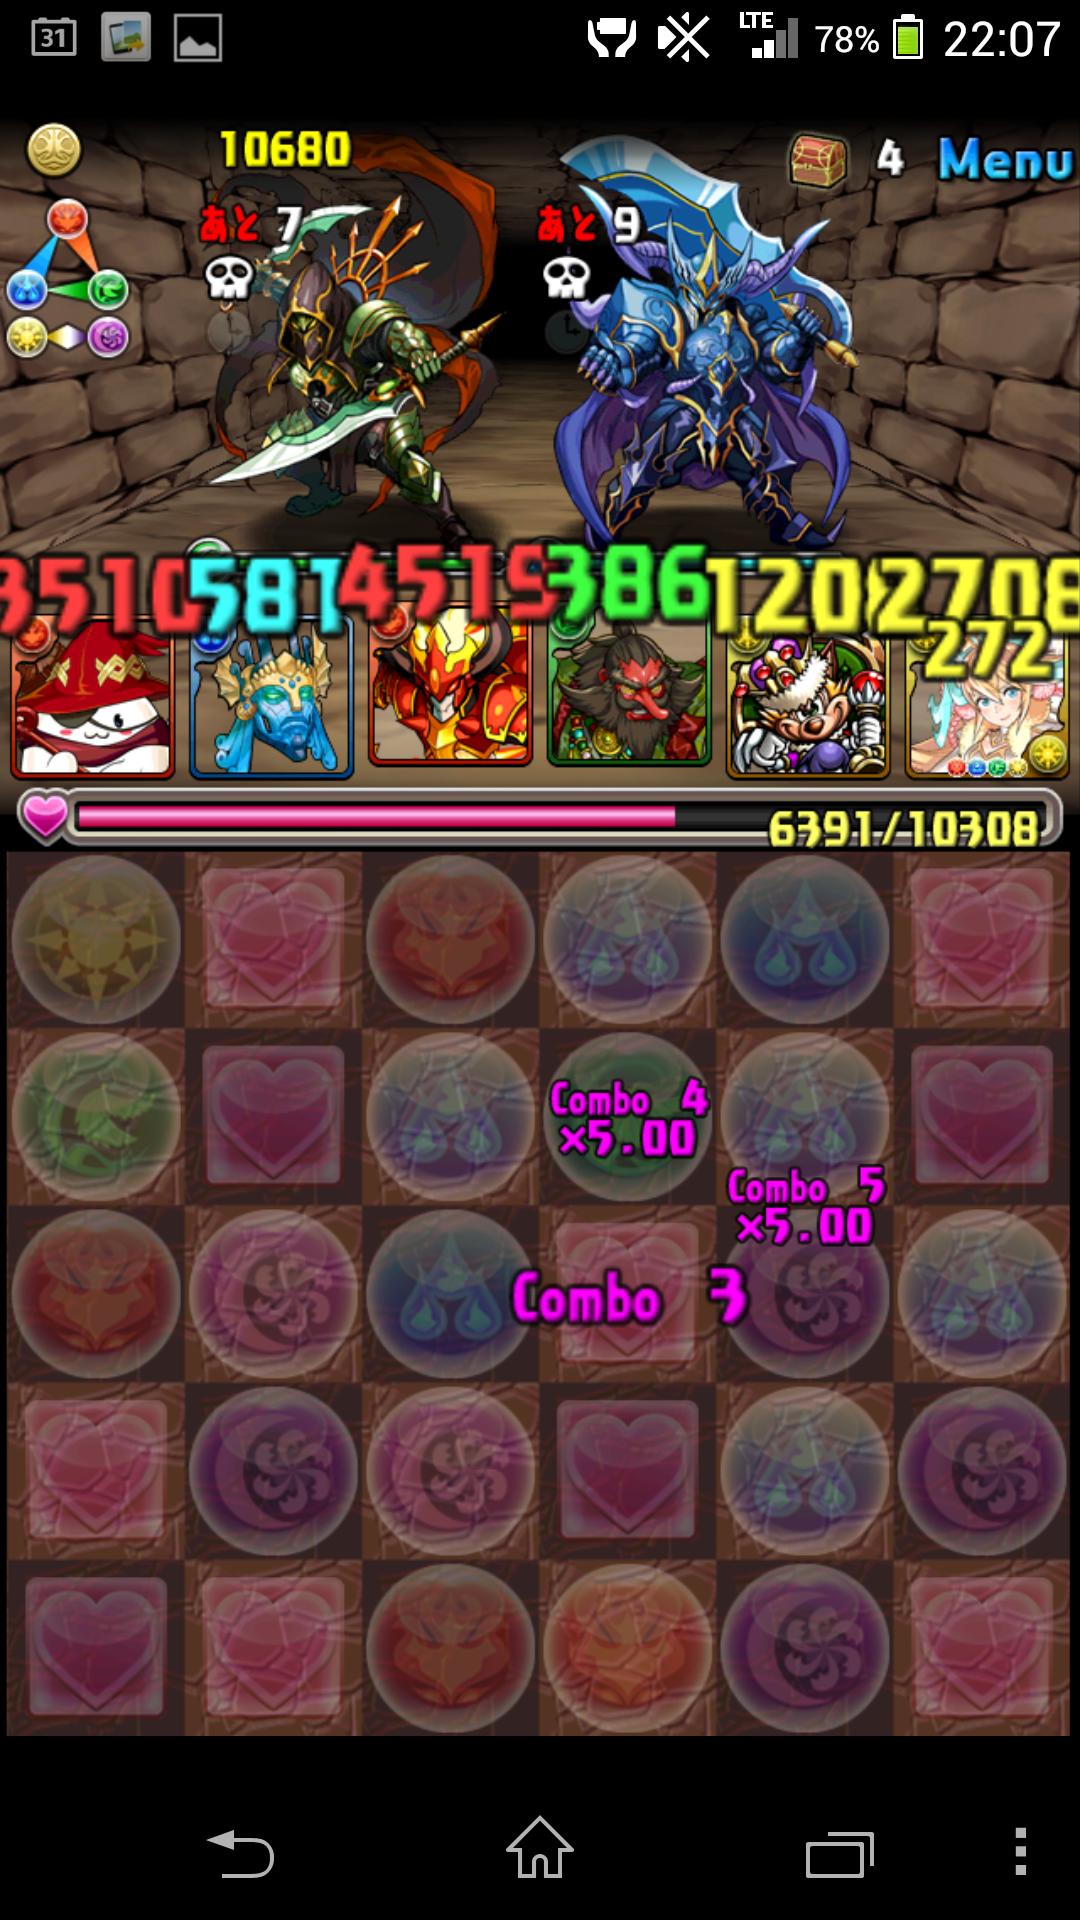 Screenshot_2014-05-12-22-07-11.png